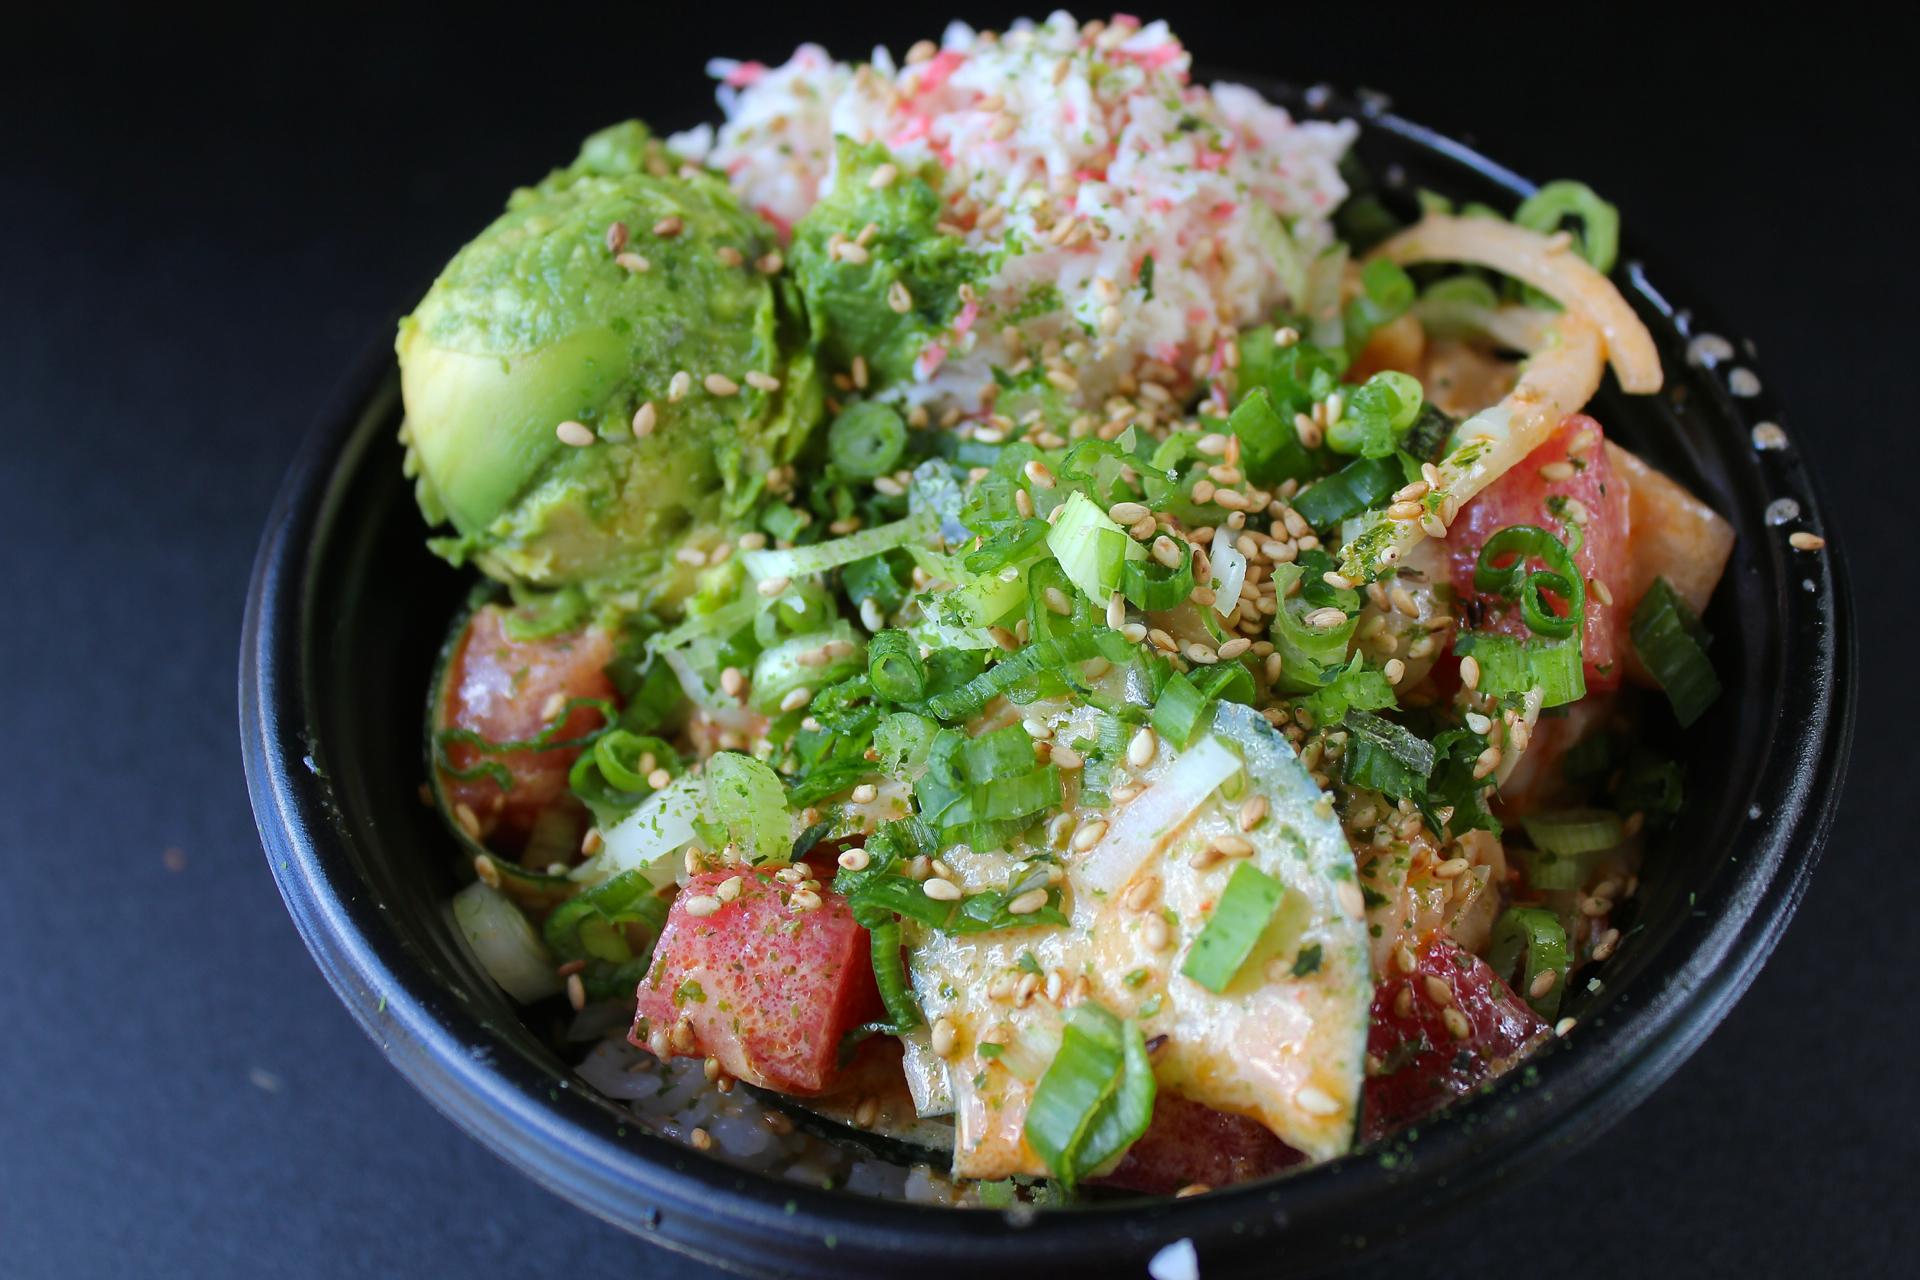 Ahi tuna and yellowtail with cucumbers, green onions, crab salad and avocado at Poki Bowl.